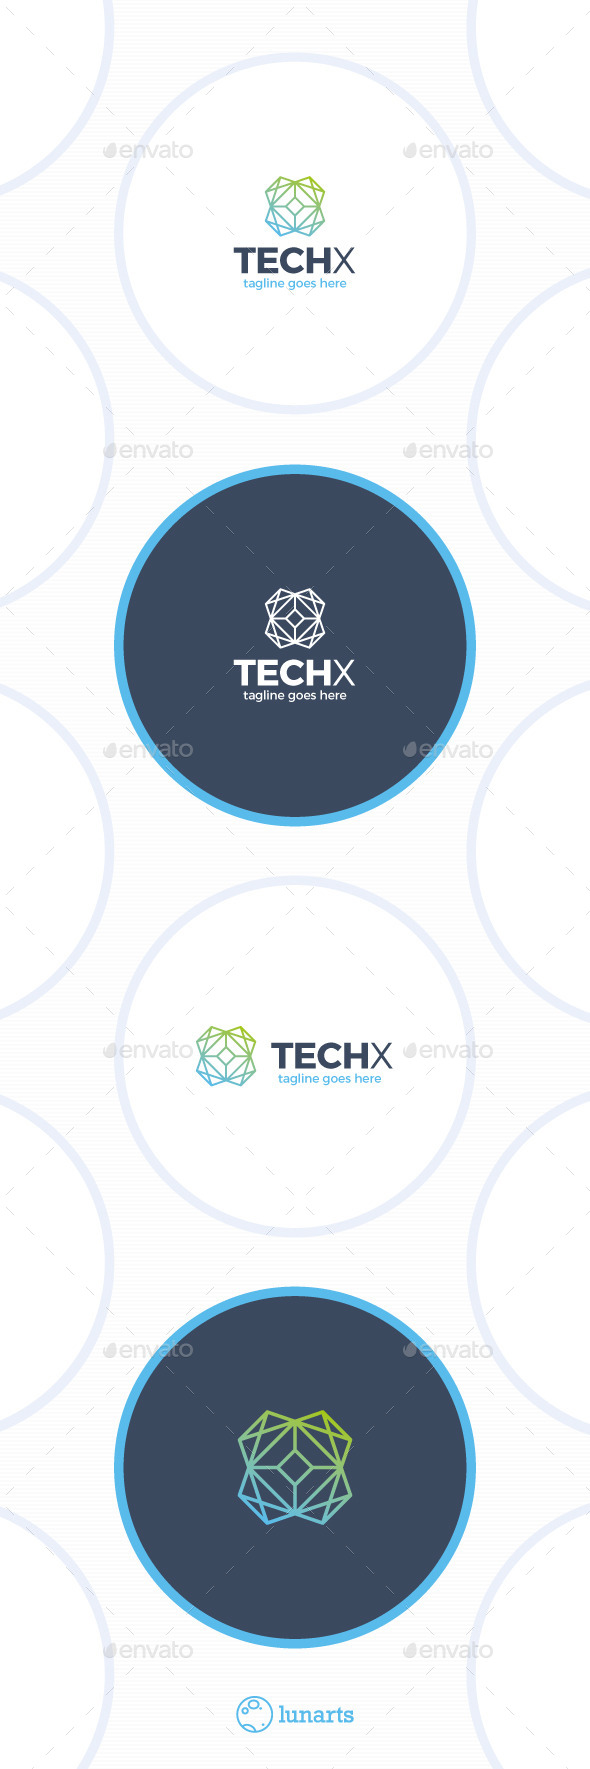 Tech Line Logo - Letter X